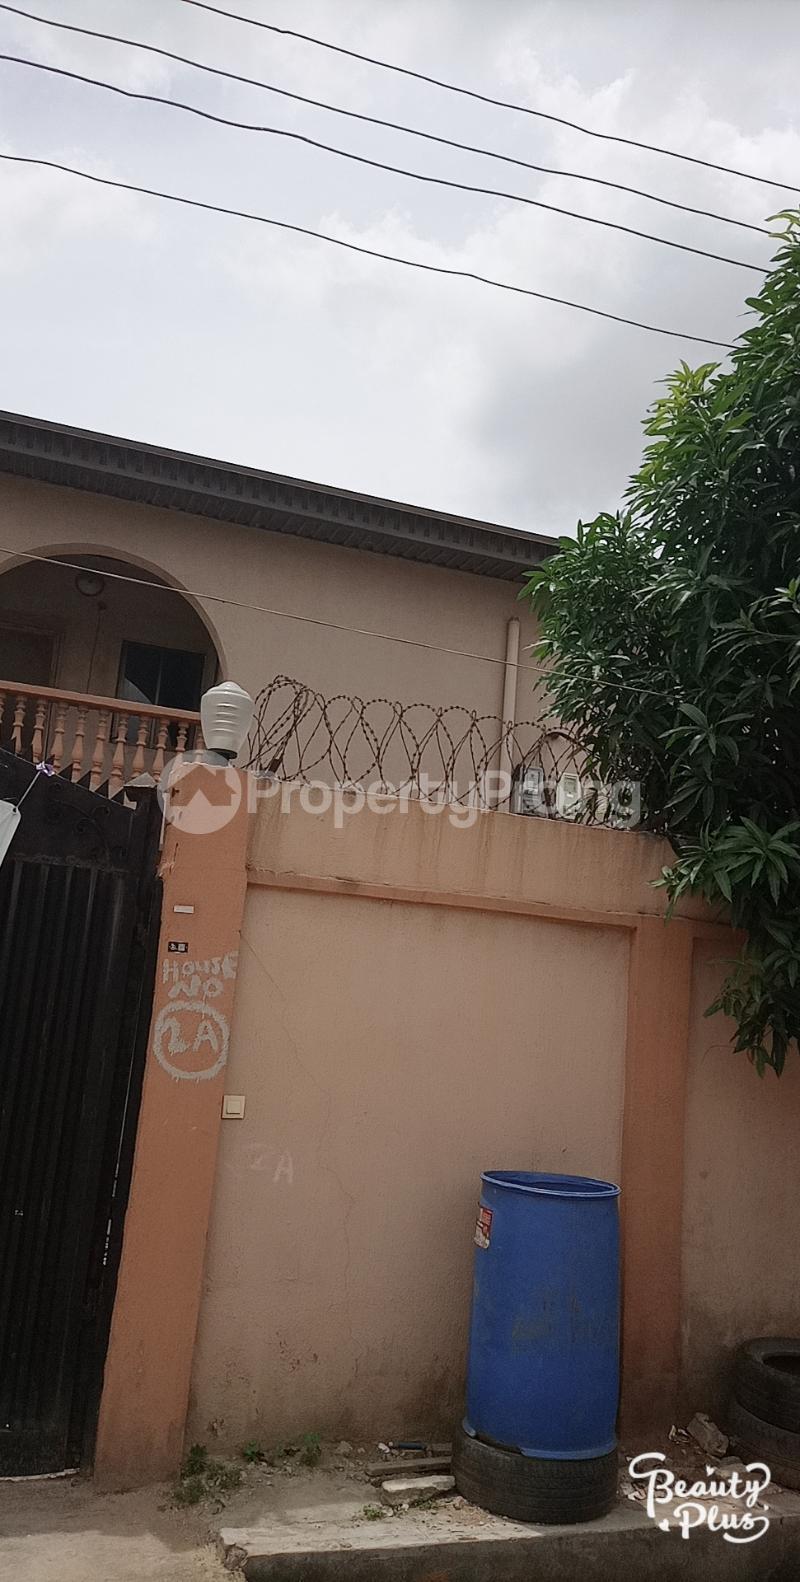 5 bedroom Semi Detached Duplex House for sale Ajao estate Isolo. Lagos Ajao Estate Isolo Lagos - 1